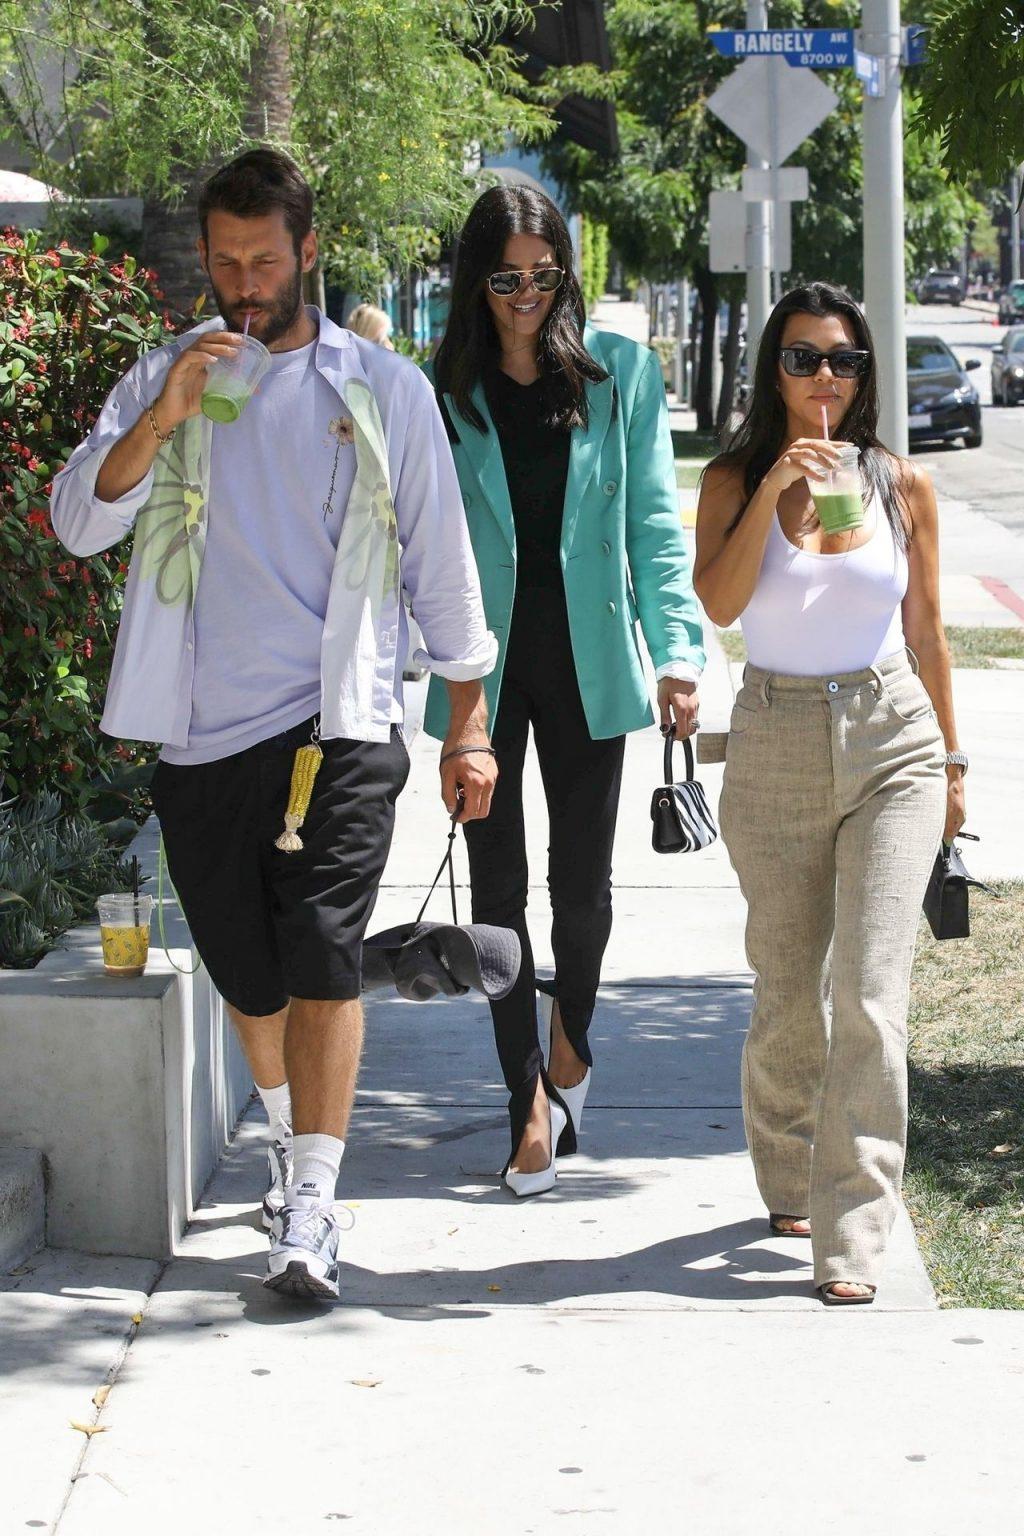 Kourtney Kardashian See Through Thefappeningblog Com 118 102